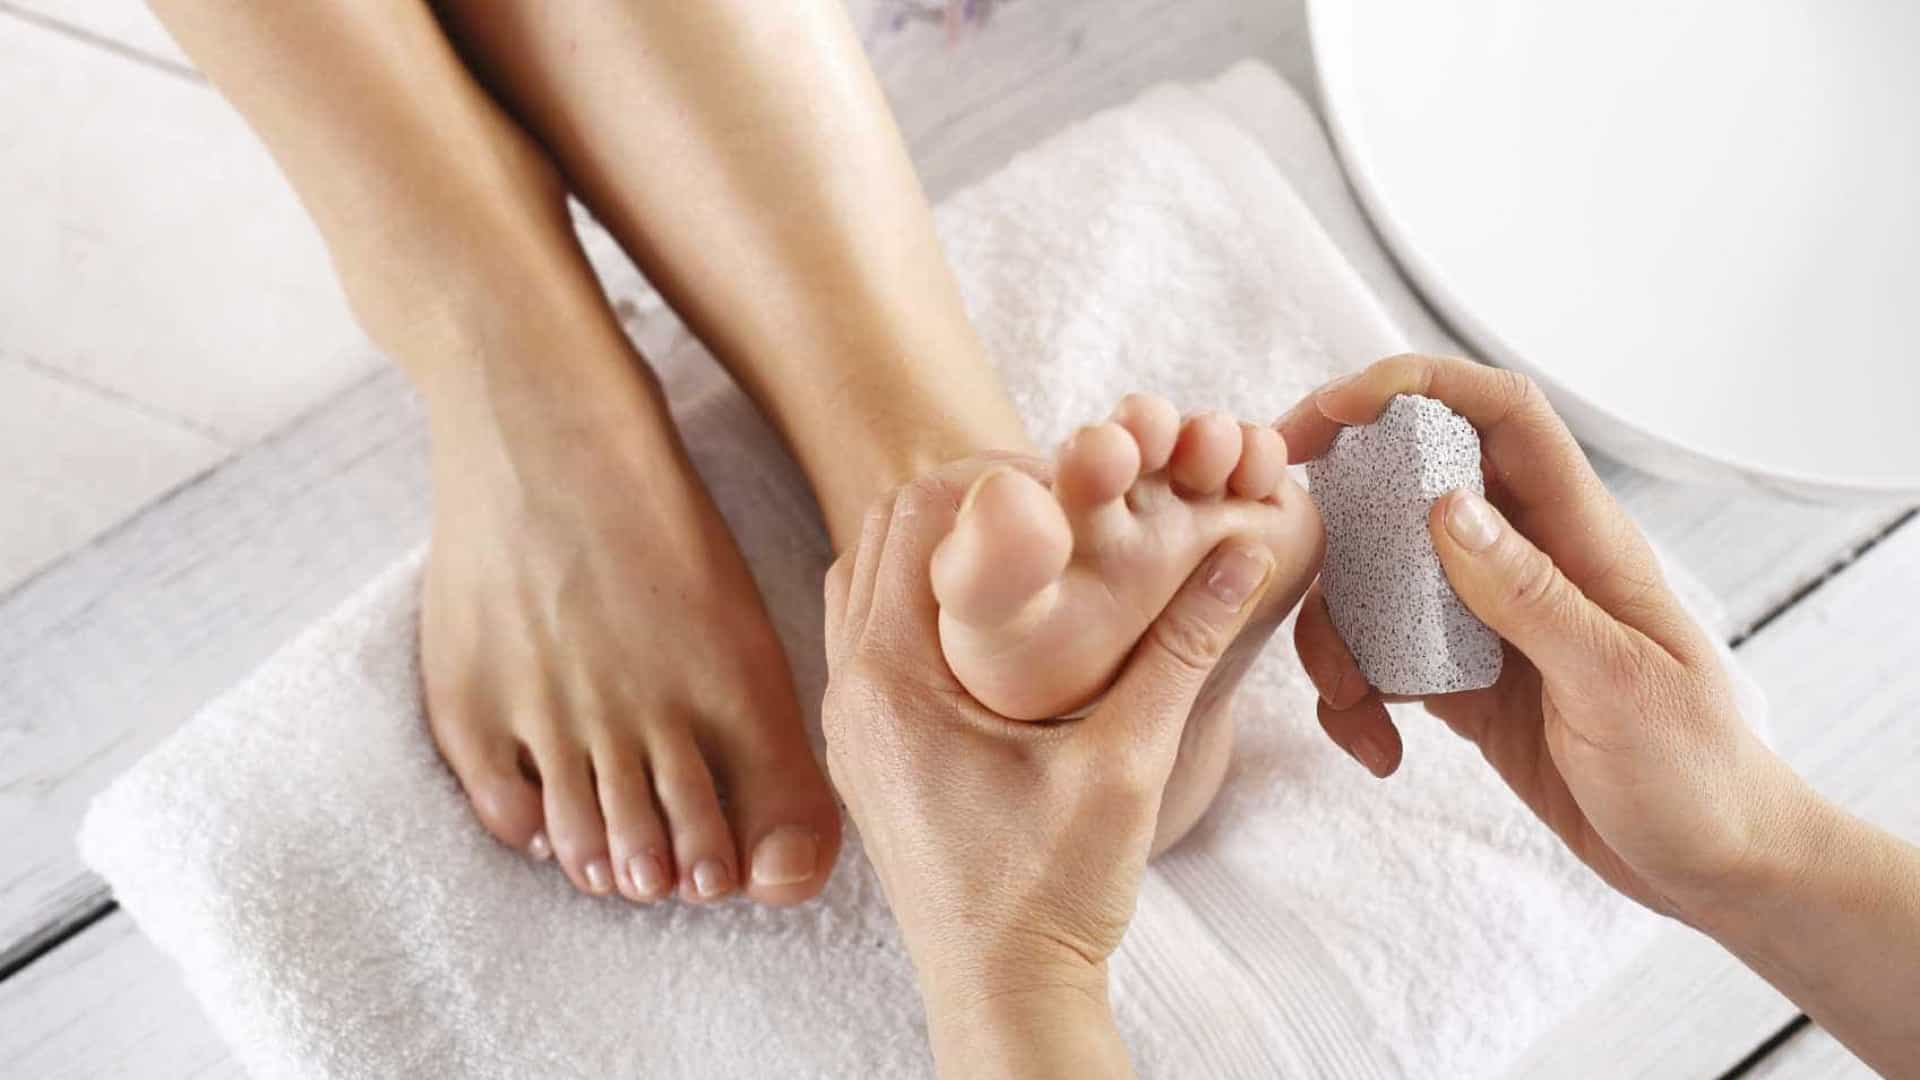 Aprenda a cuidar dos pés no frio e evitar rachaduras